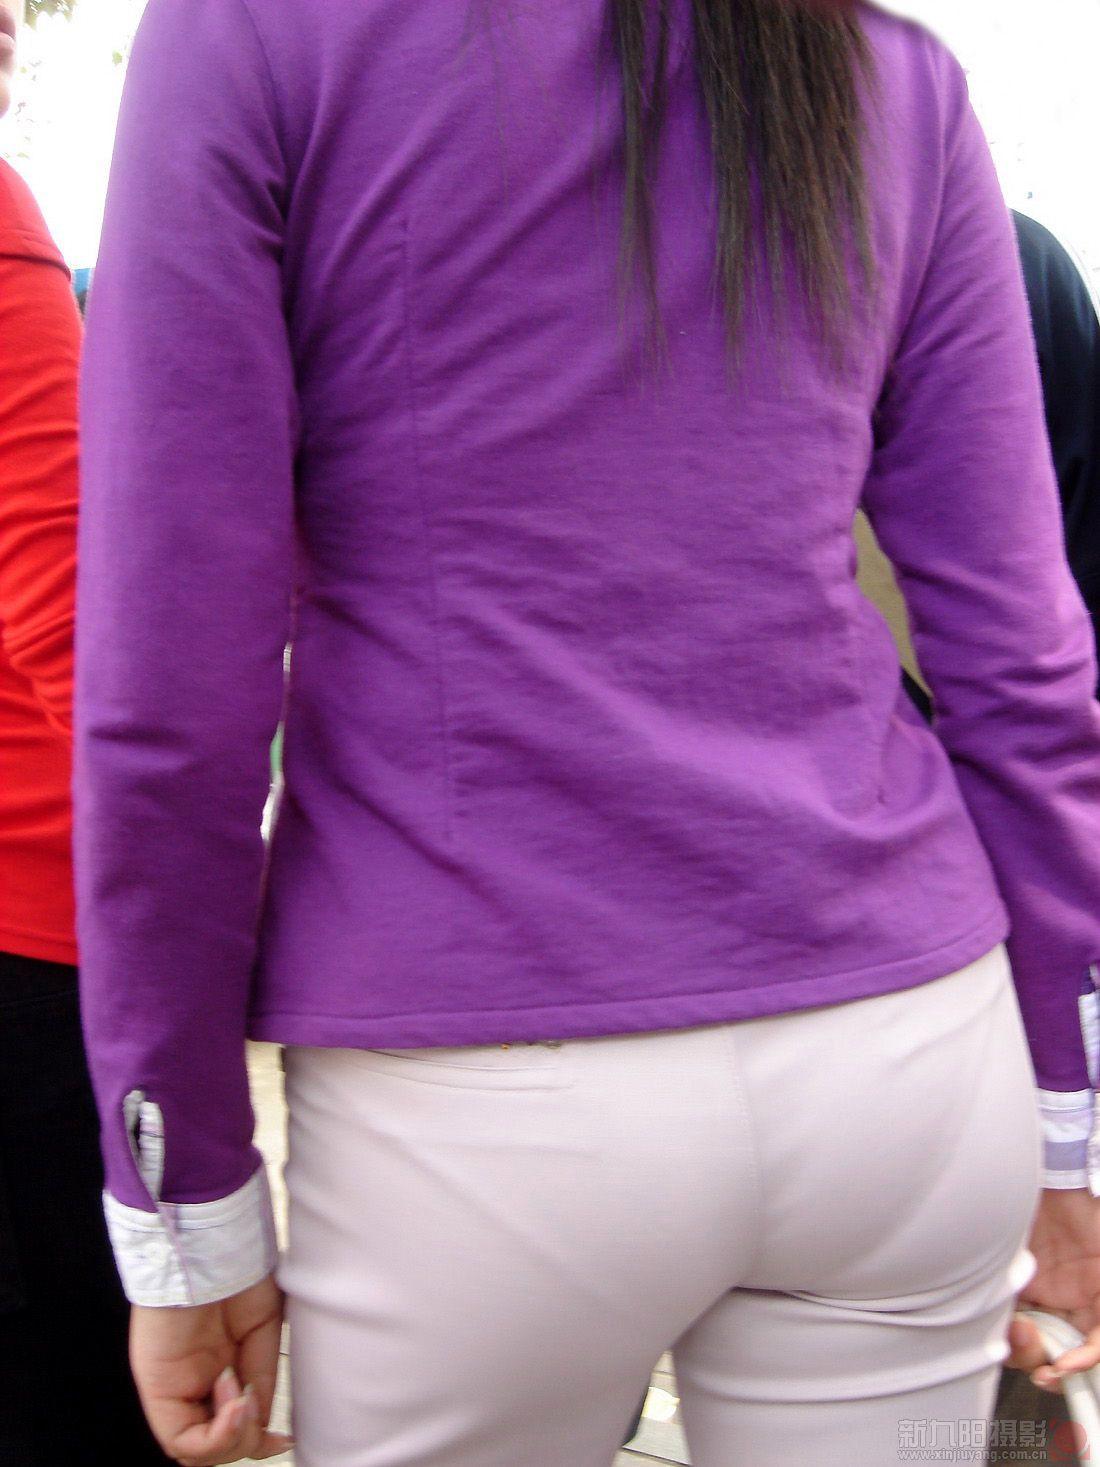 Белые трусики под штанами